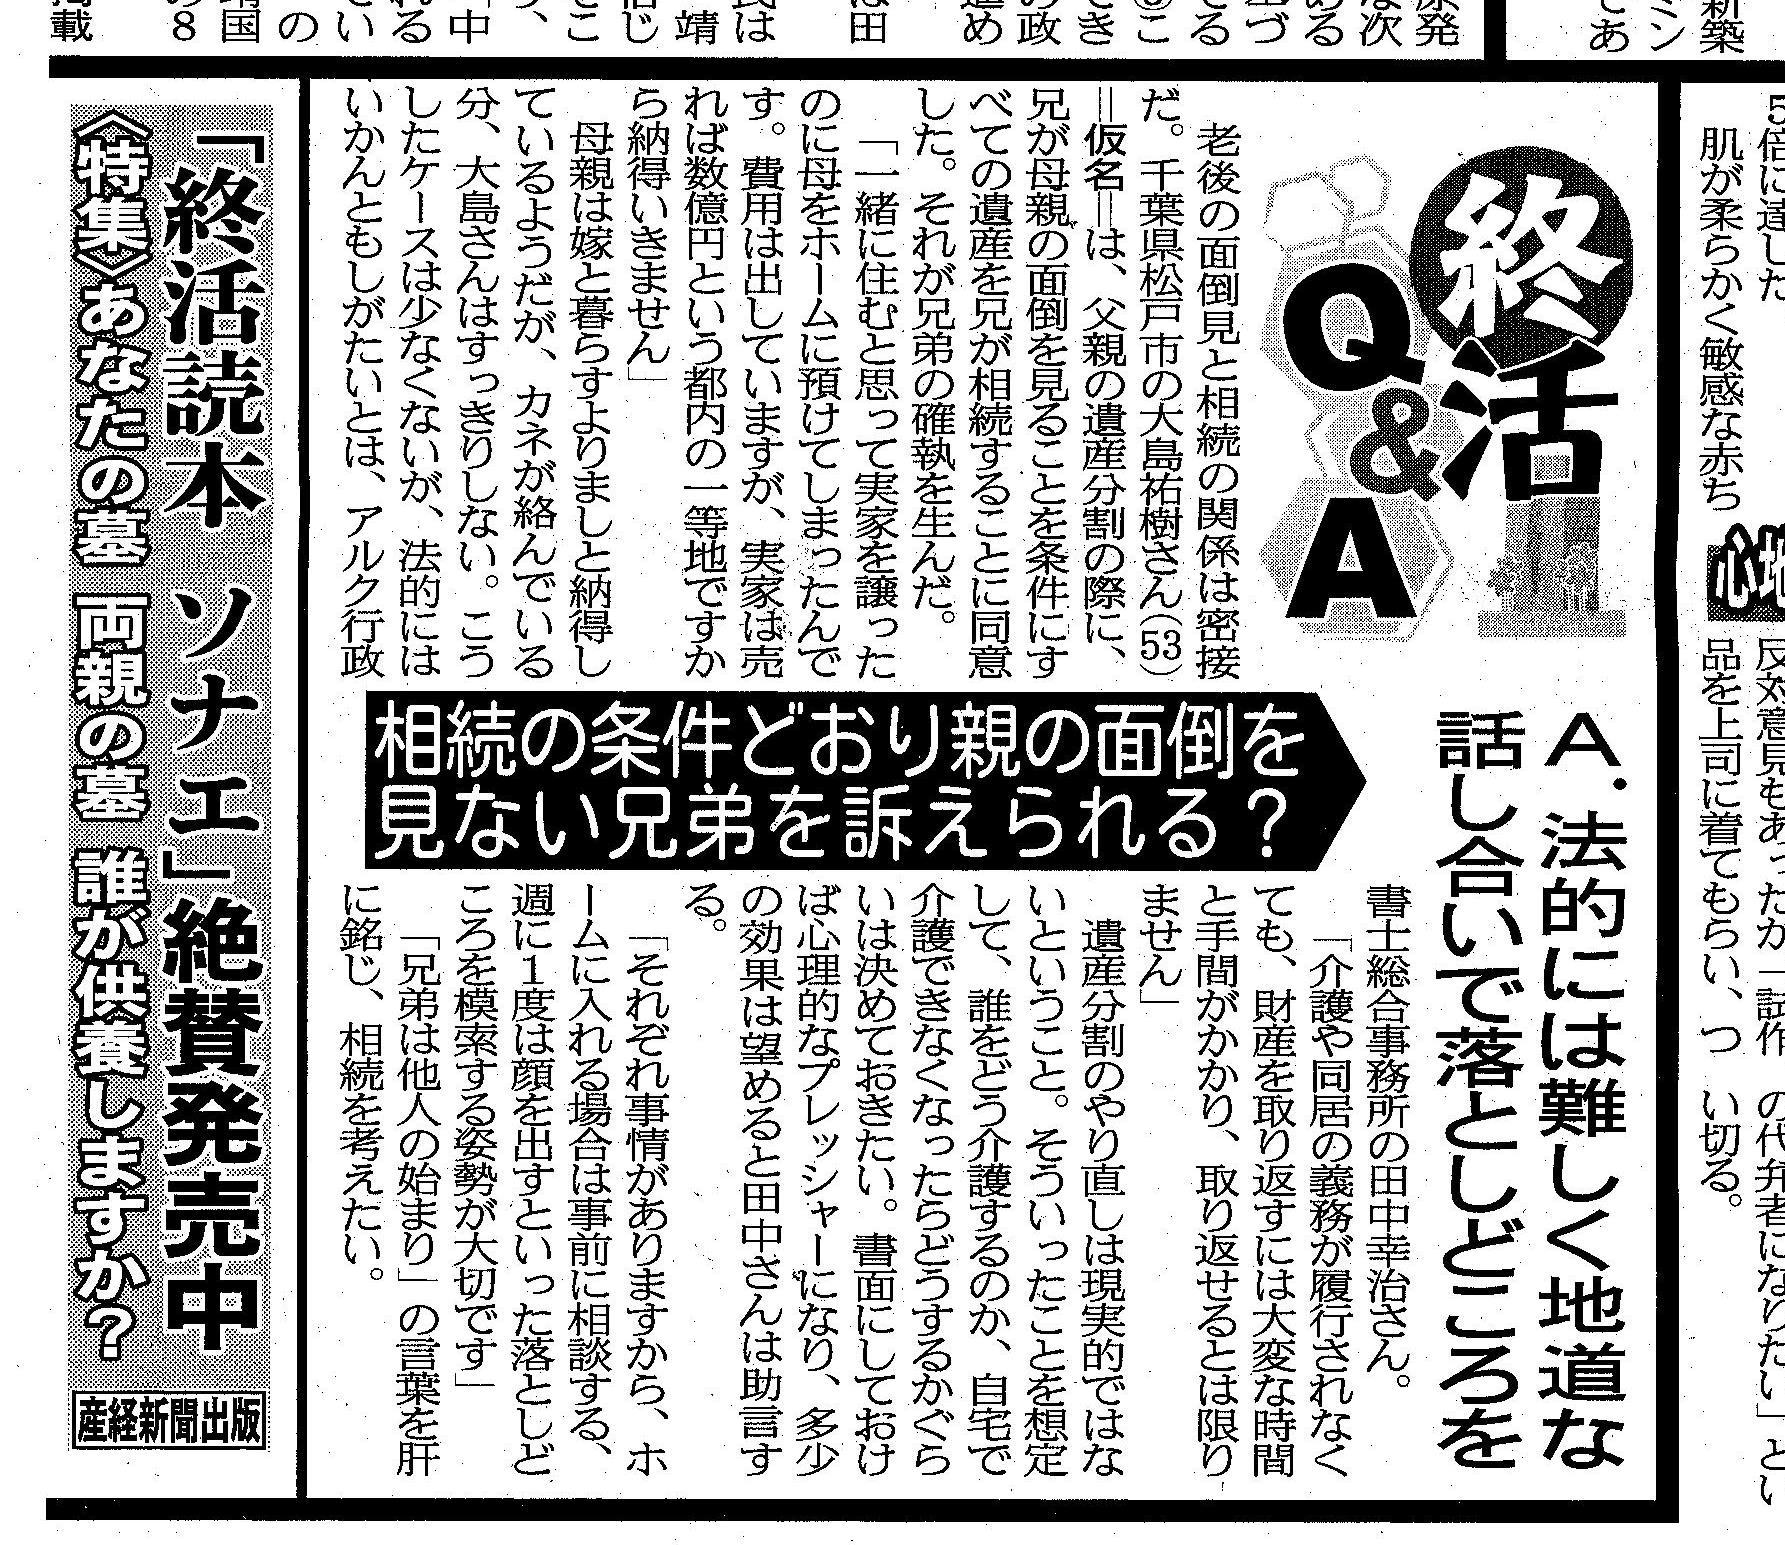 yukanfuji2.jpg